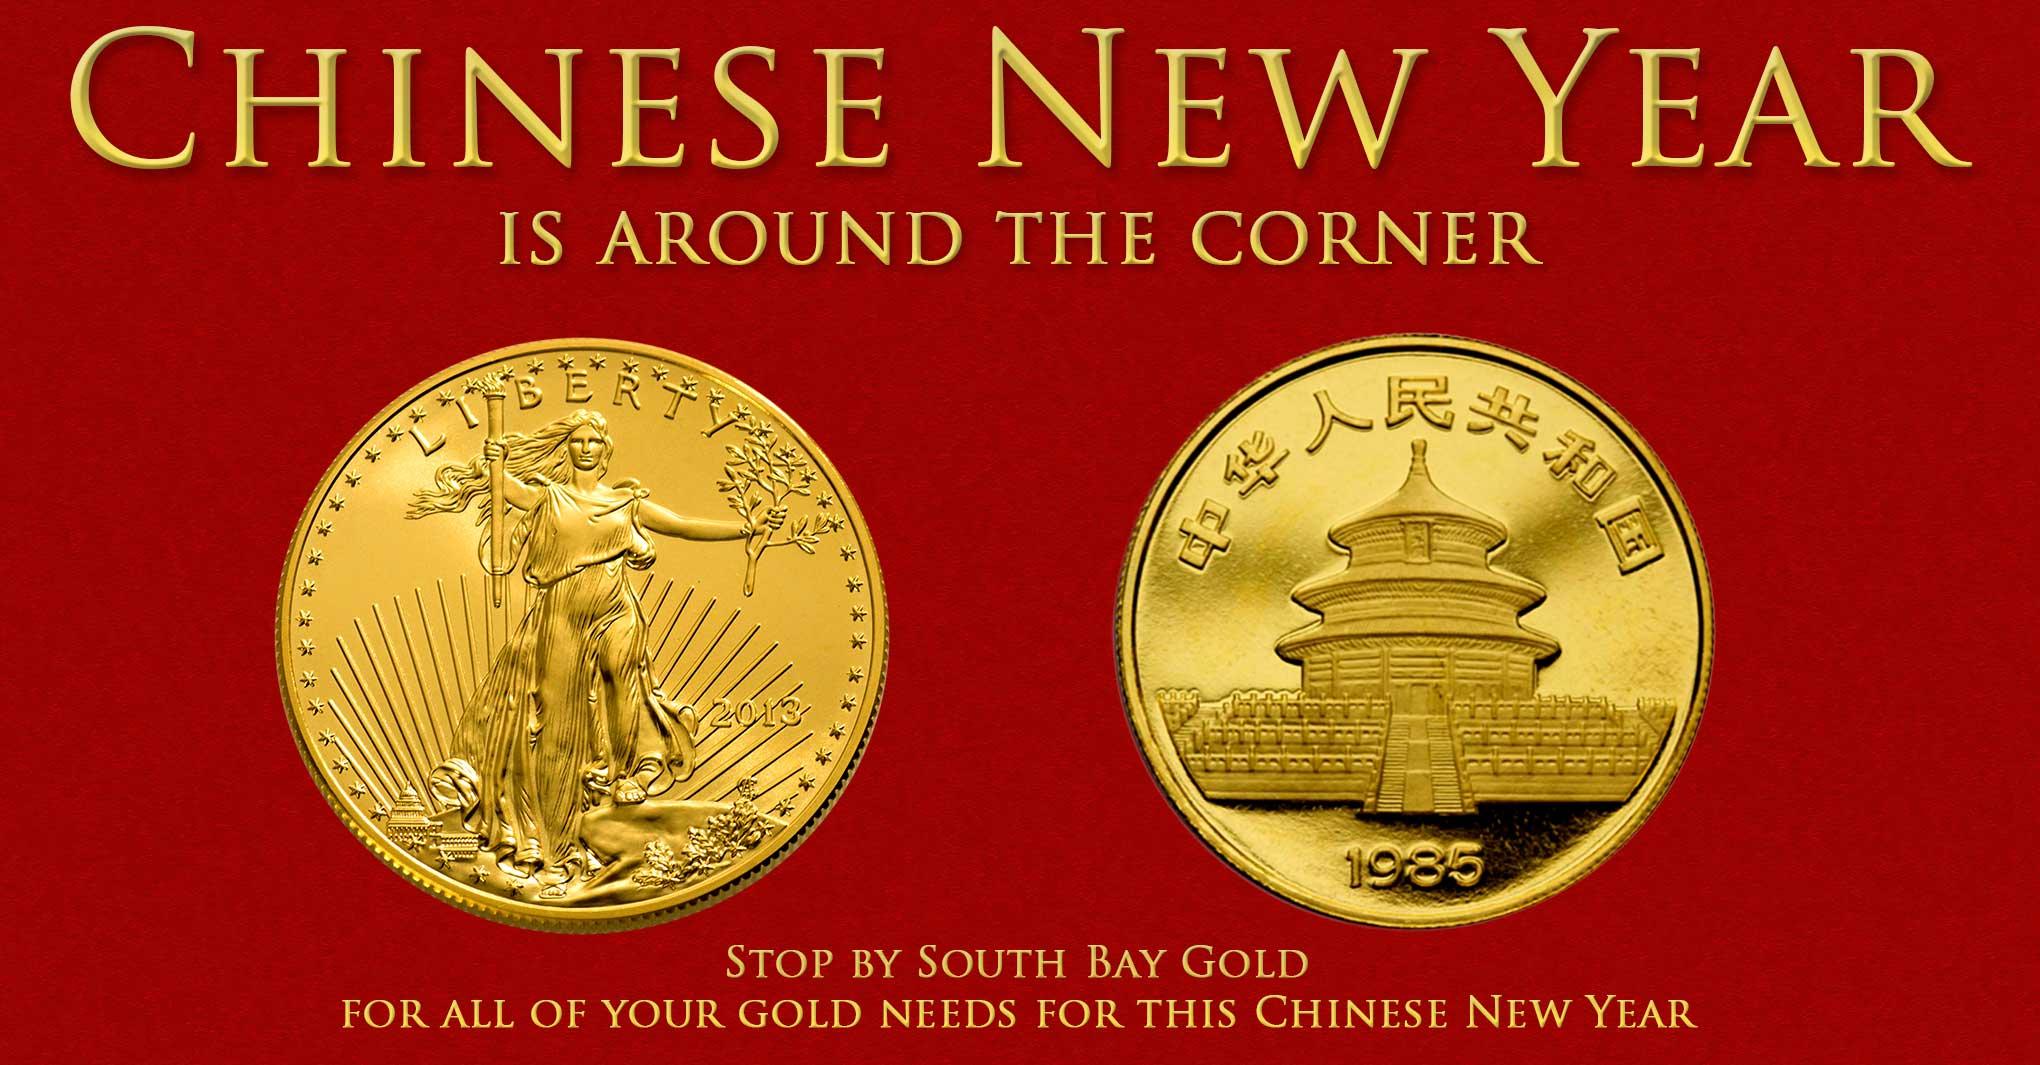 Chinese New Year 2015 - Buy Gold Eagle, Panda, Maple, 90505 90802 92612